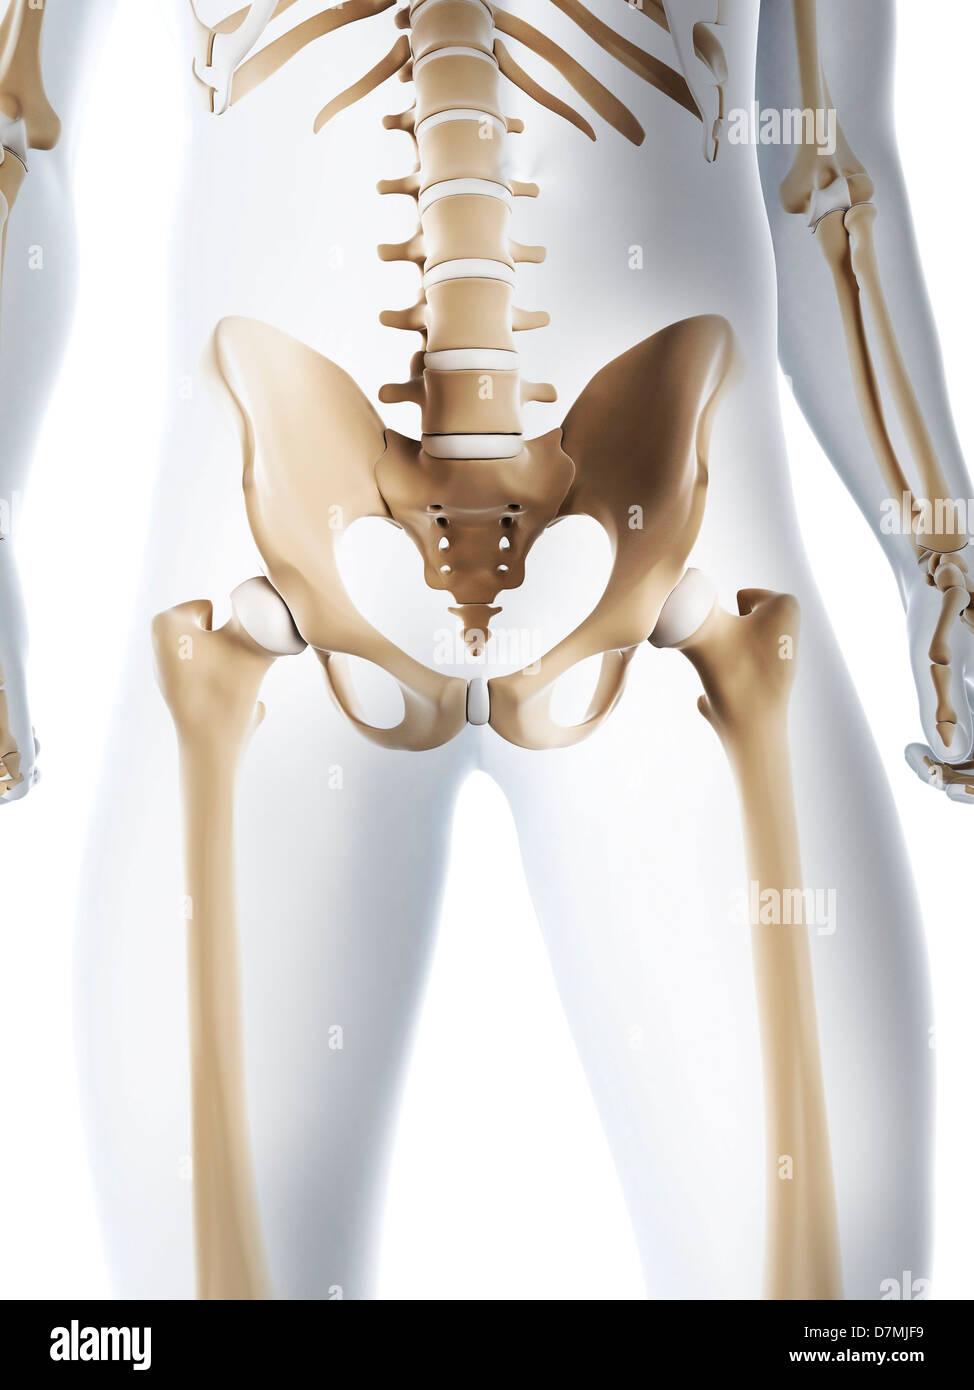 Male Pelvis Bones Stock Photos & Male Pelvis Bones Stock Images - Alamy